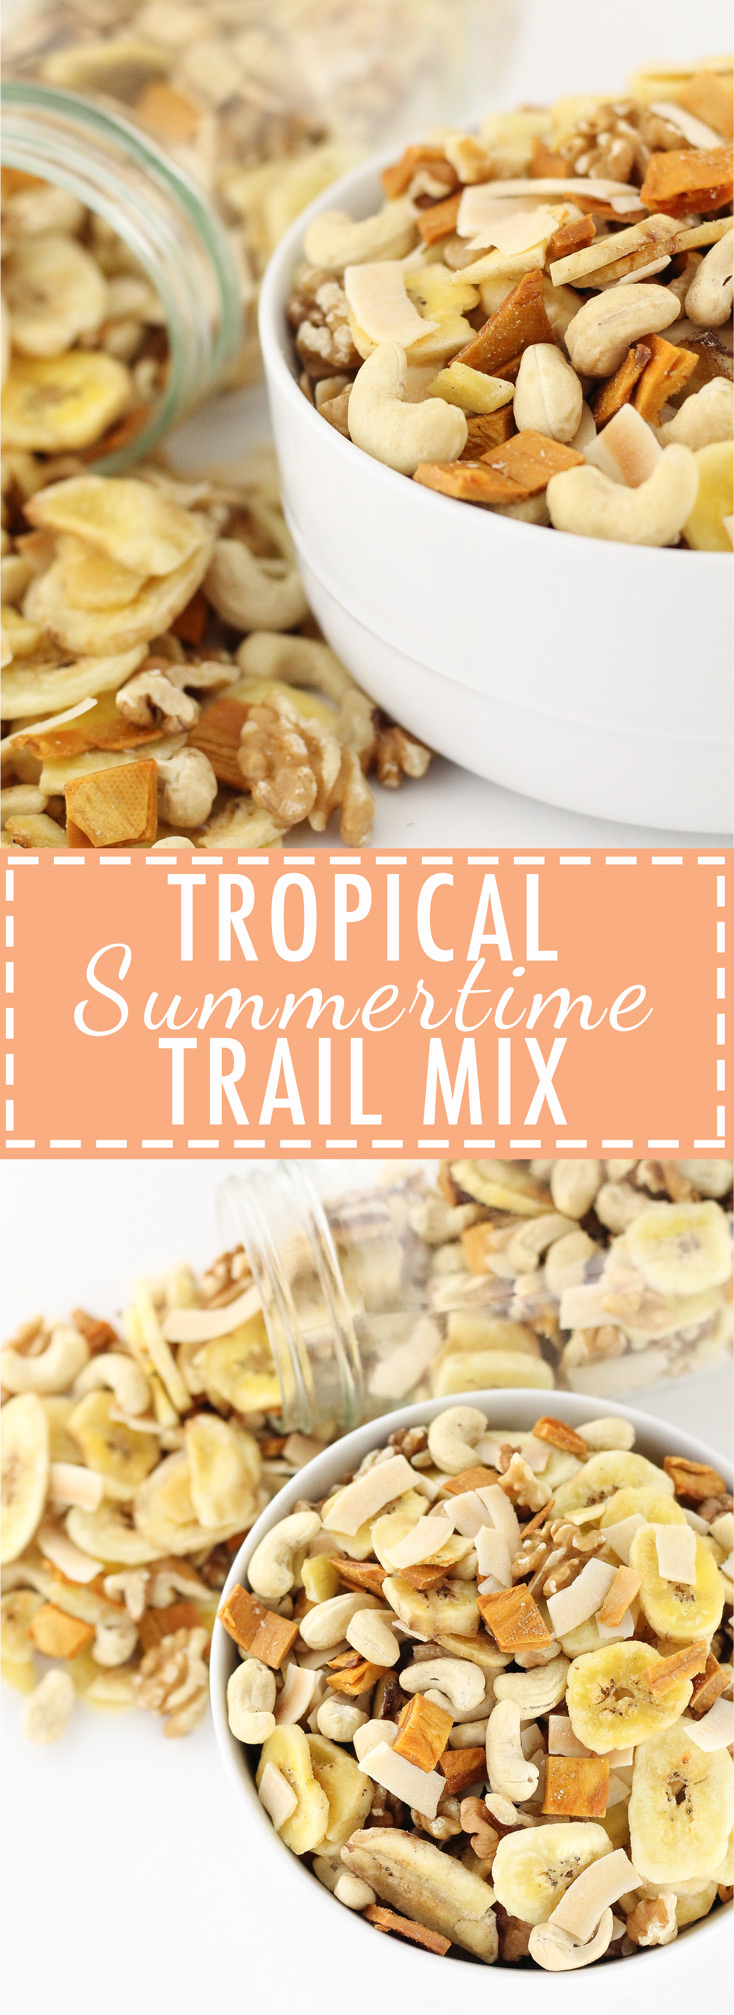 trail mix, paleo, grain free, gluten free, dairy free, easy, quick, homemade, recipe, summertime, tropical, mango, coconut